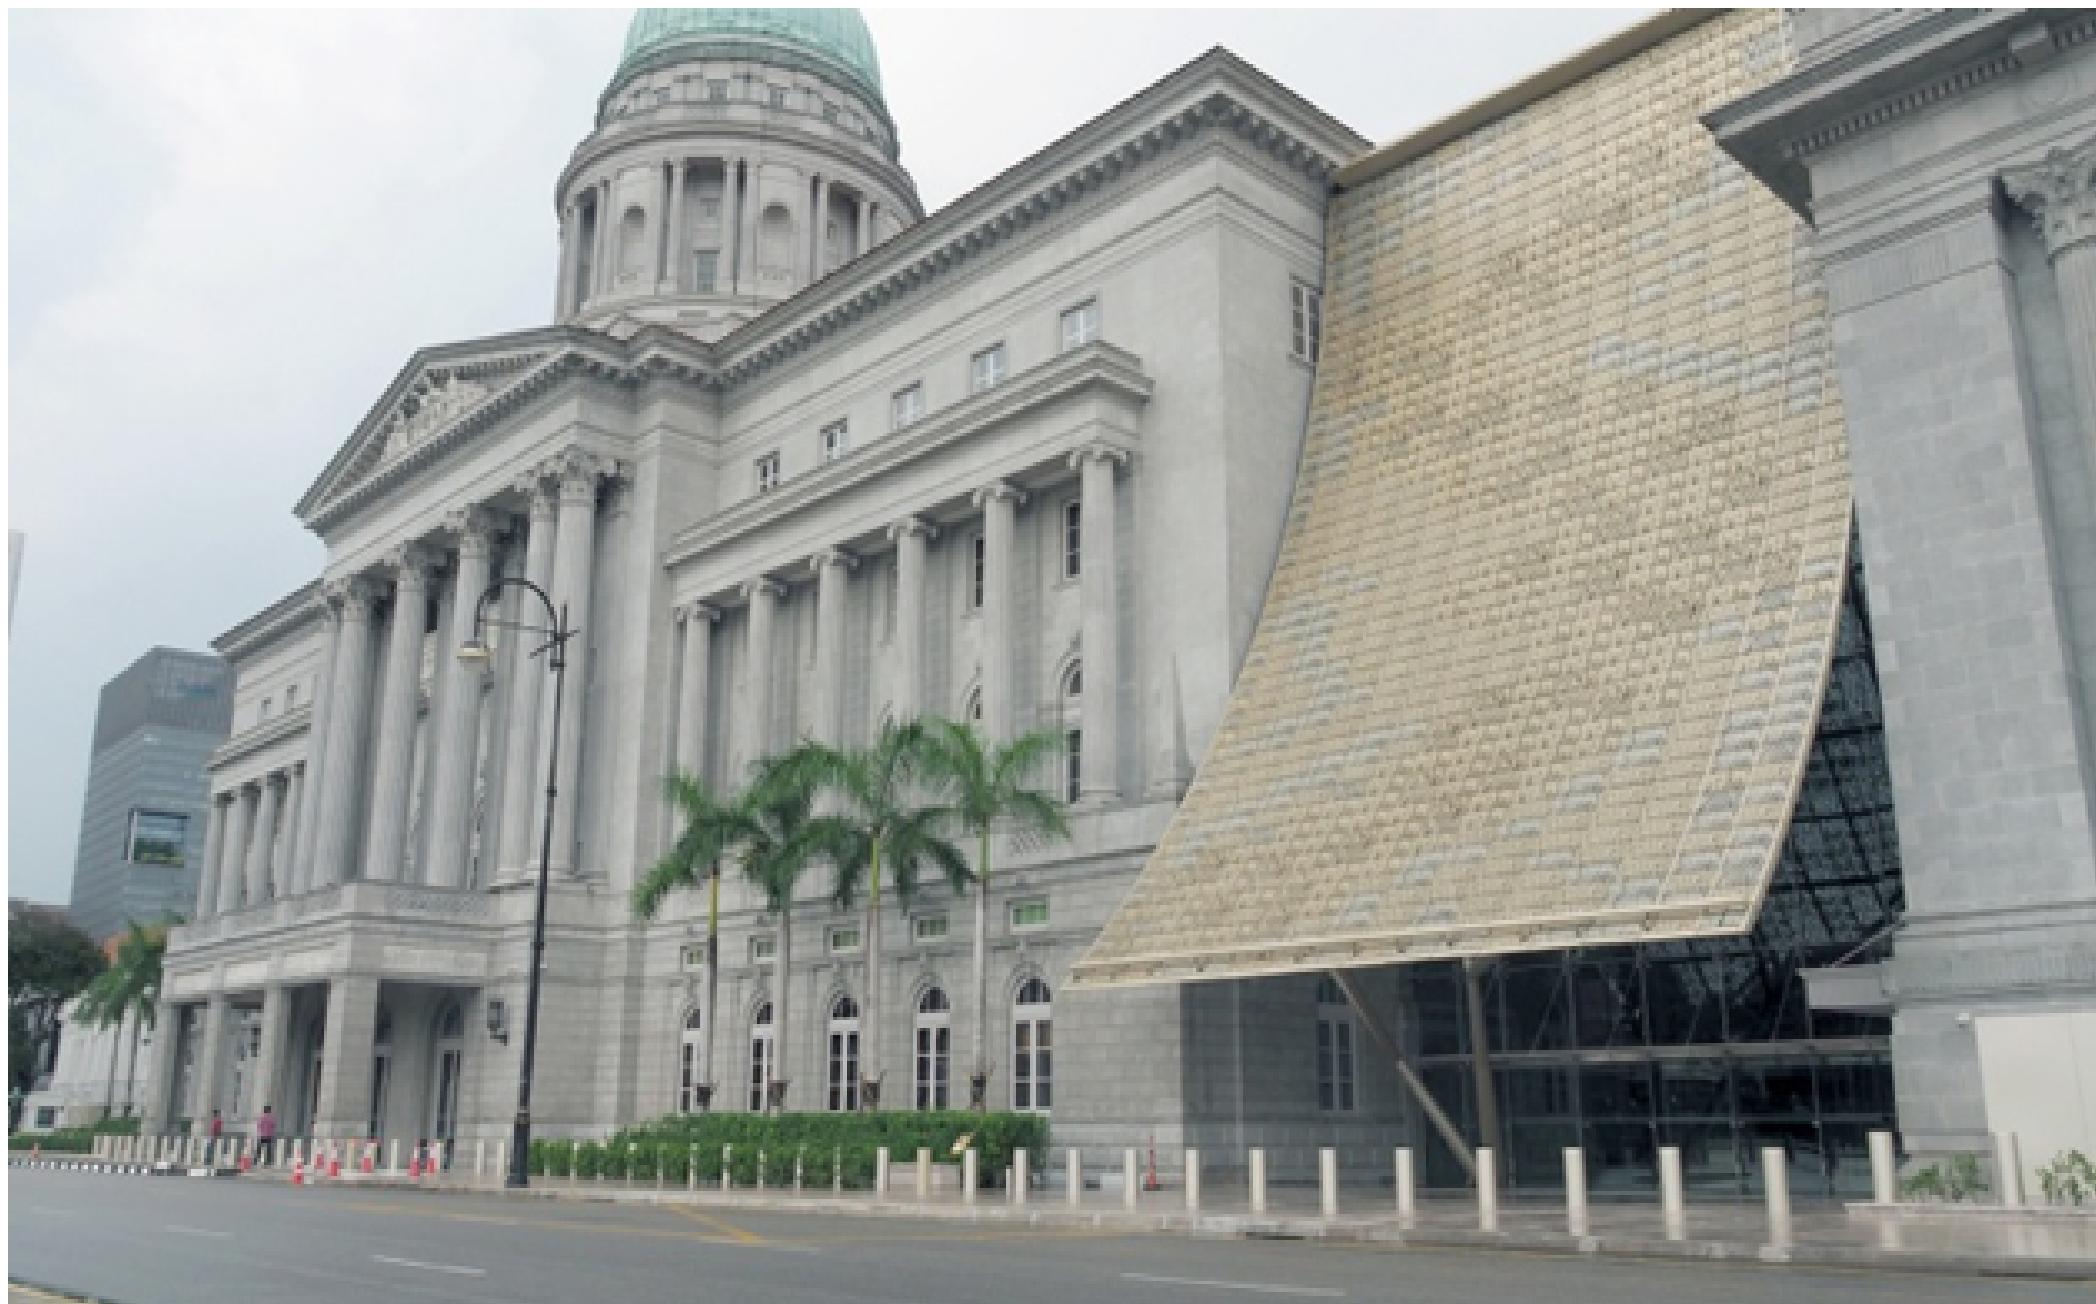 Singapore Arts Gallery